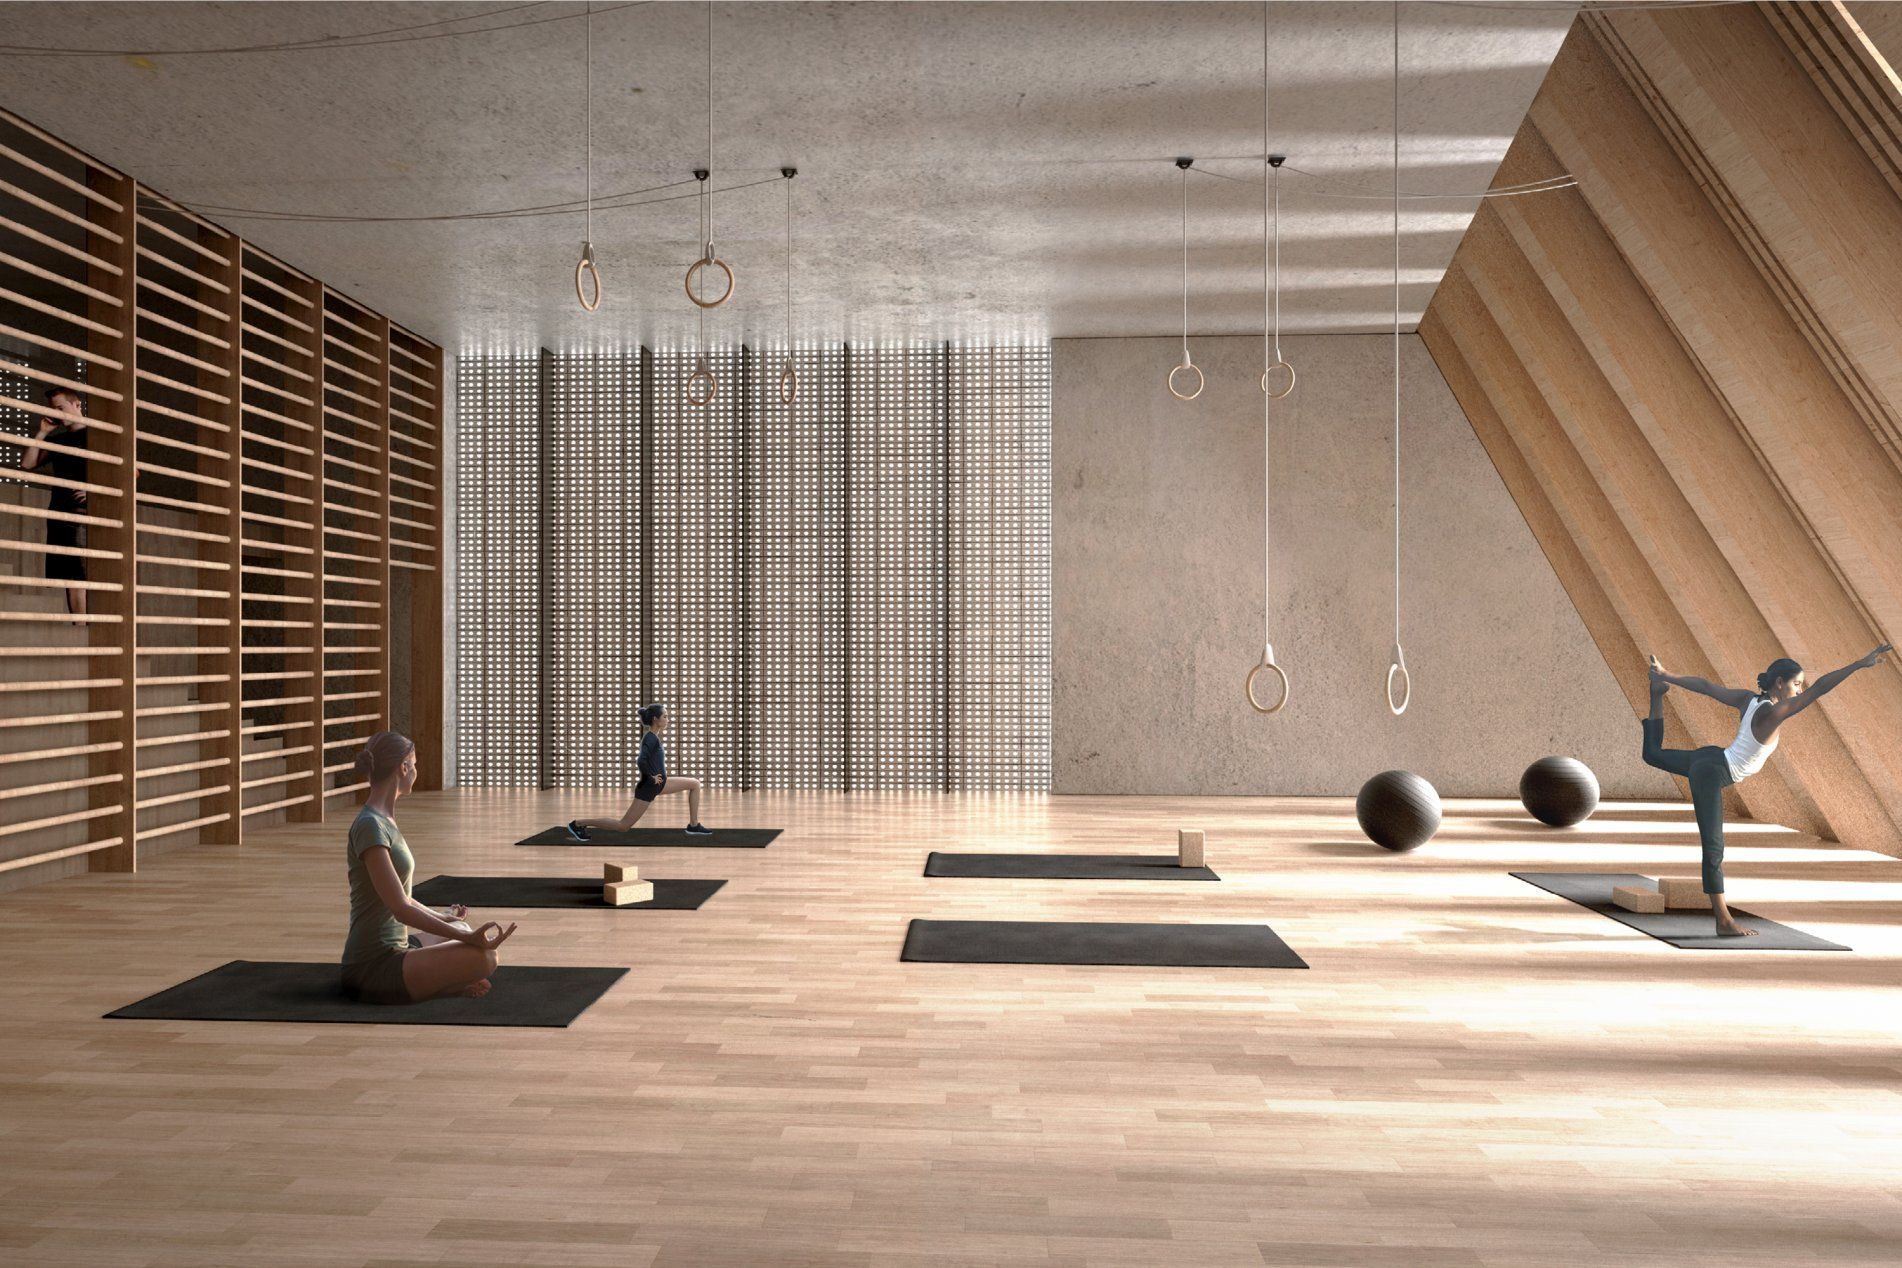 Pin By Alexlin On 健身房 In 2020 Gym Interior Yoga Studio Design Interior